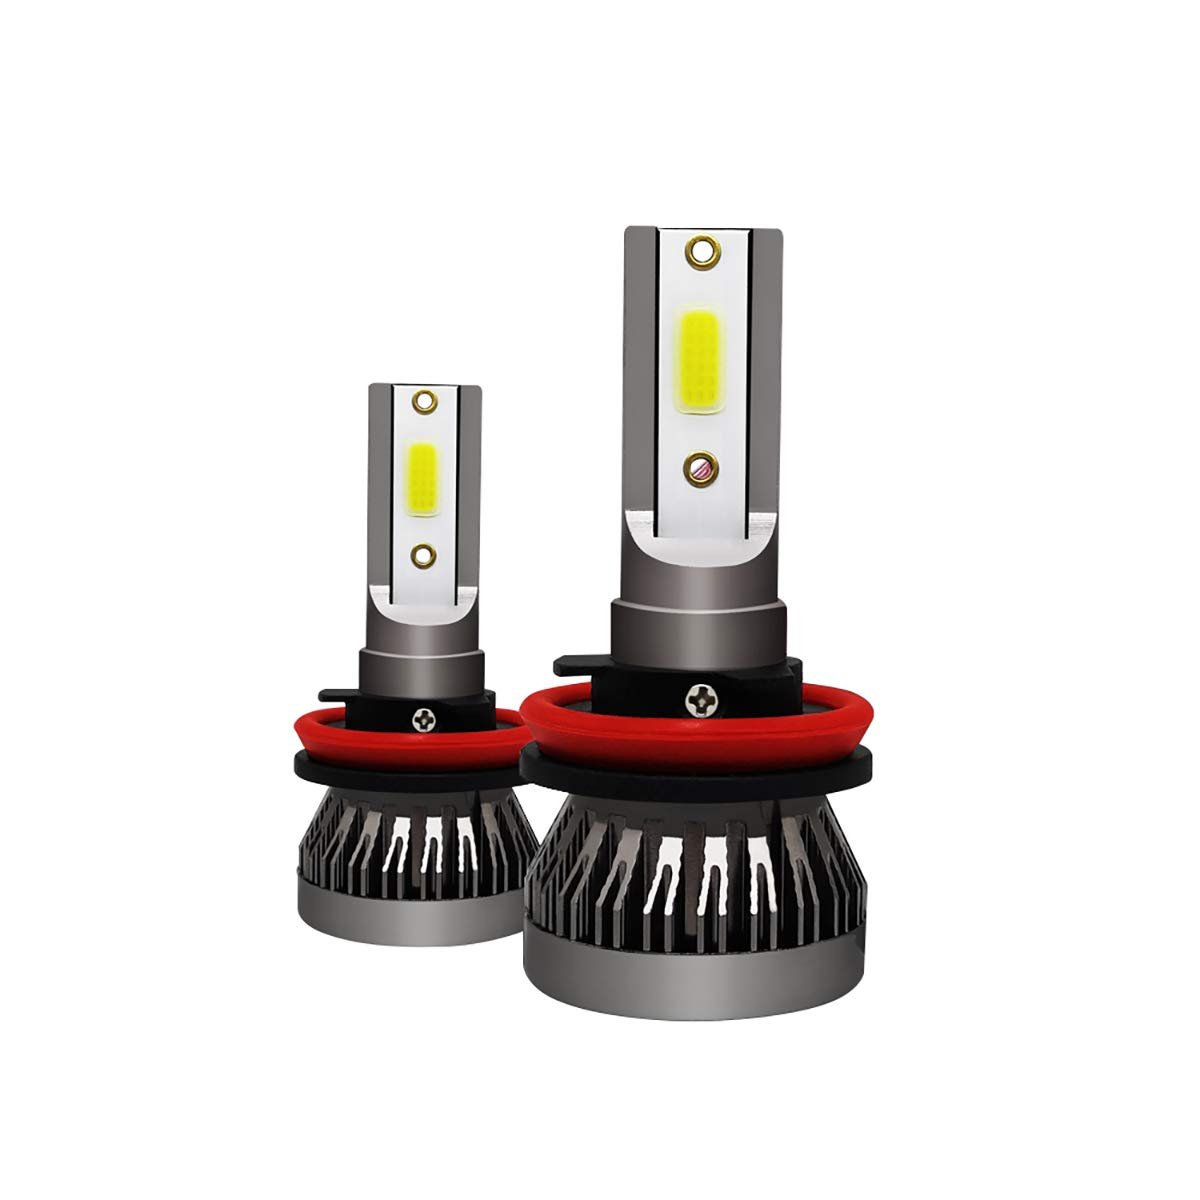 New MINI1 bombilla car led headlights C6 S2 M/últiples estilos headlights lampara led (2PIECE)